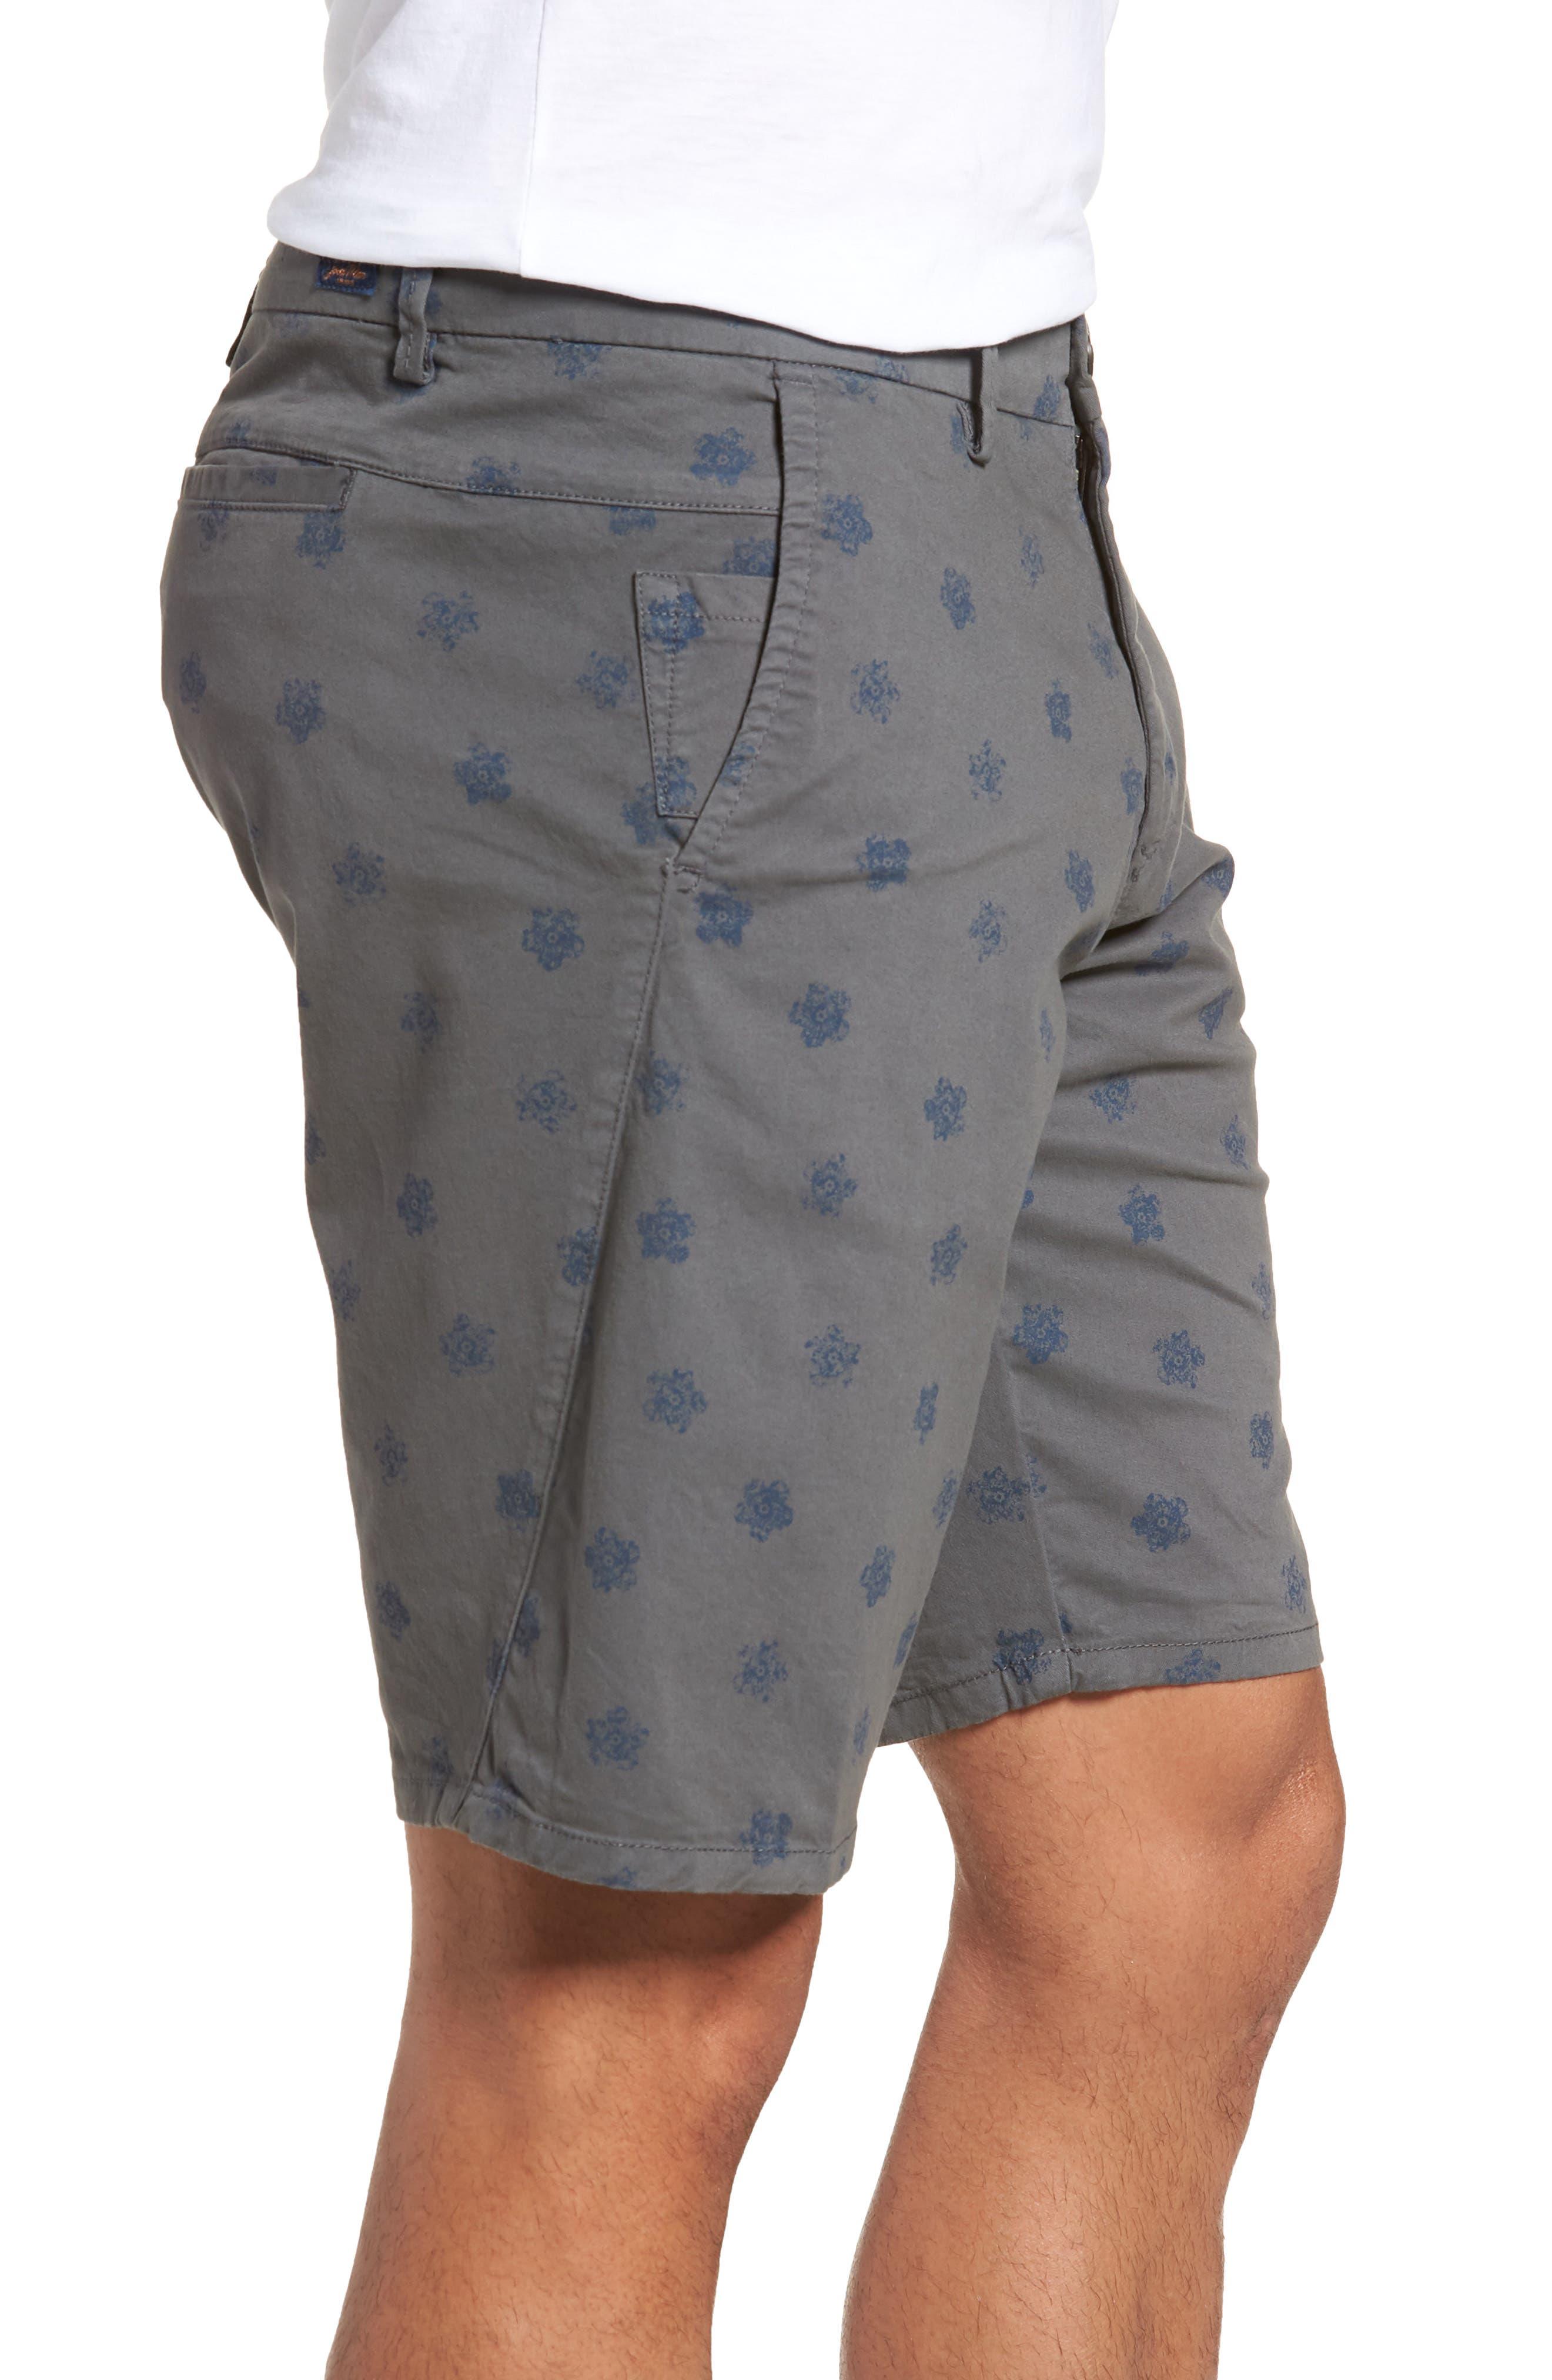 Monaco Floral Stretch Shorts,                             Alternate thumbnail 3, color,                             051